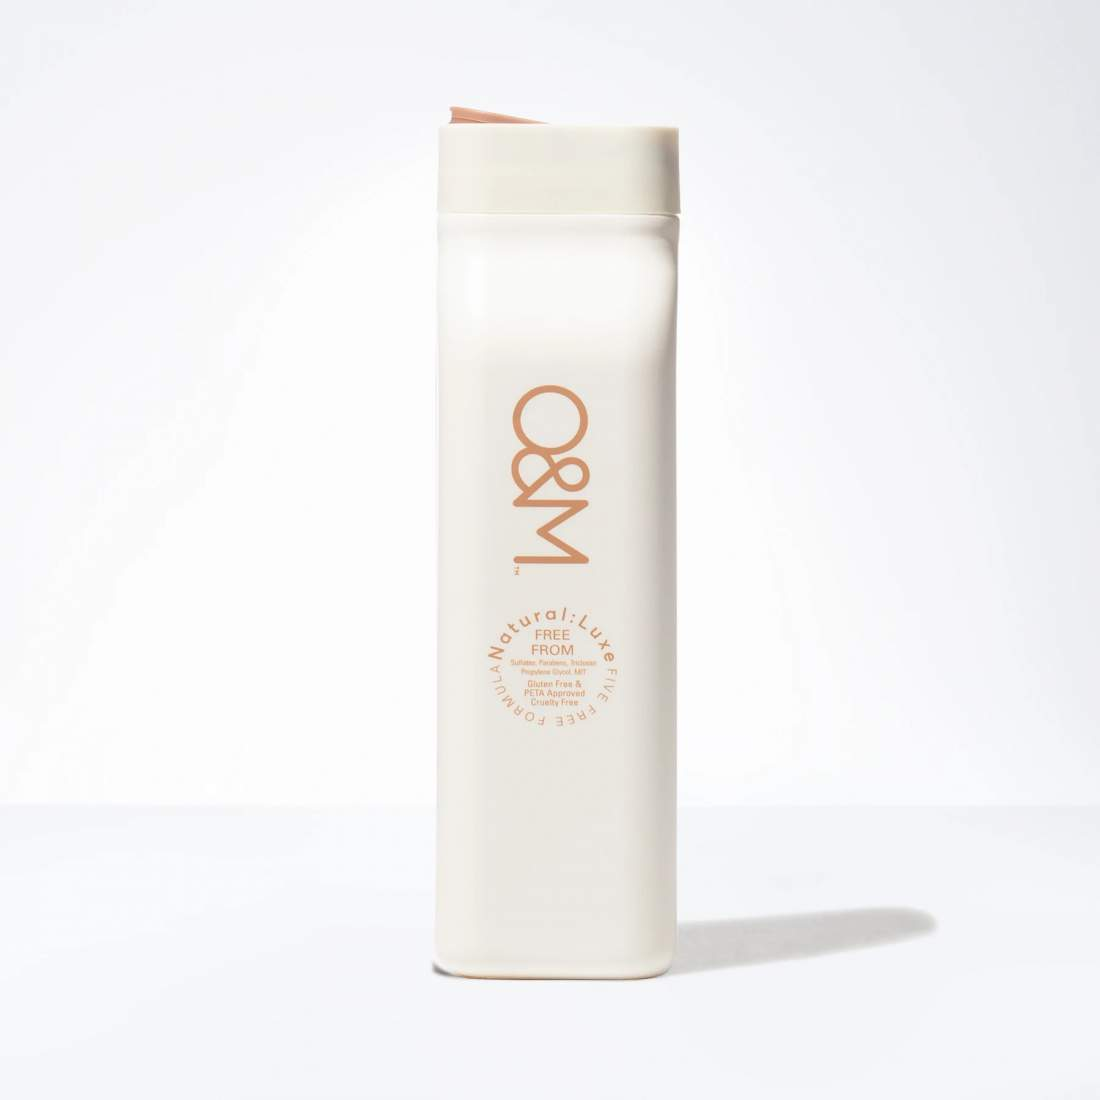 Kondicionáló mindennapos használatra-O&M-Maintain the Mane Conditioner Dail